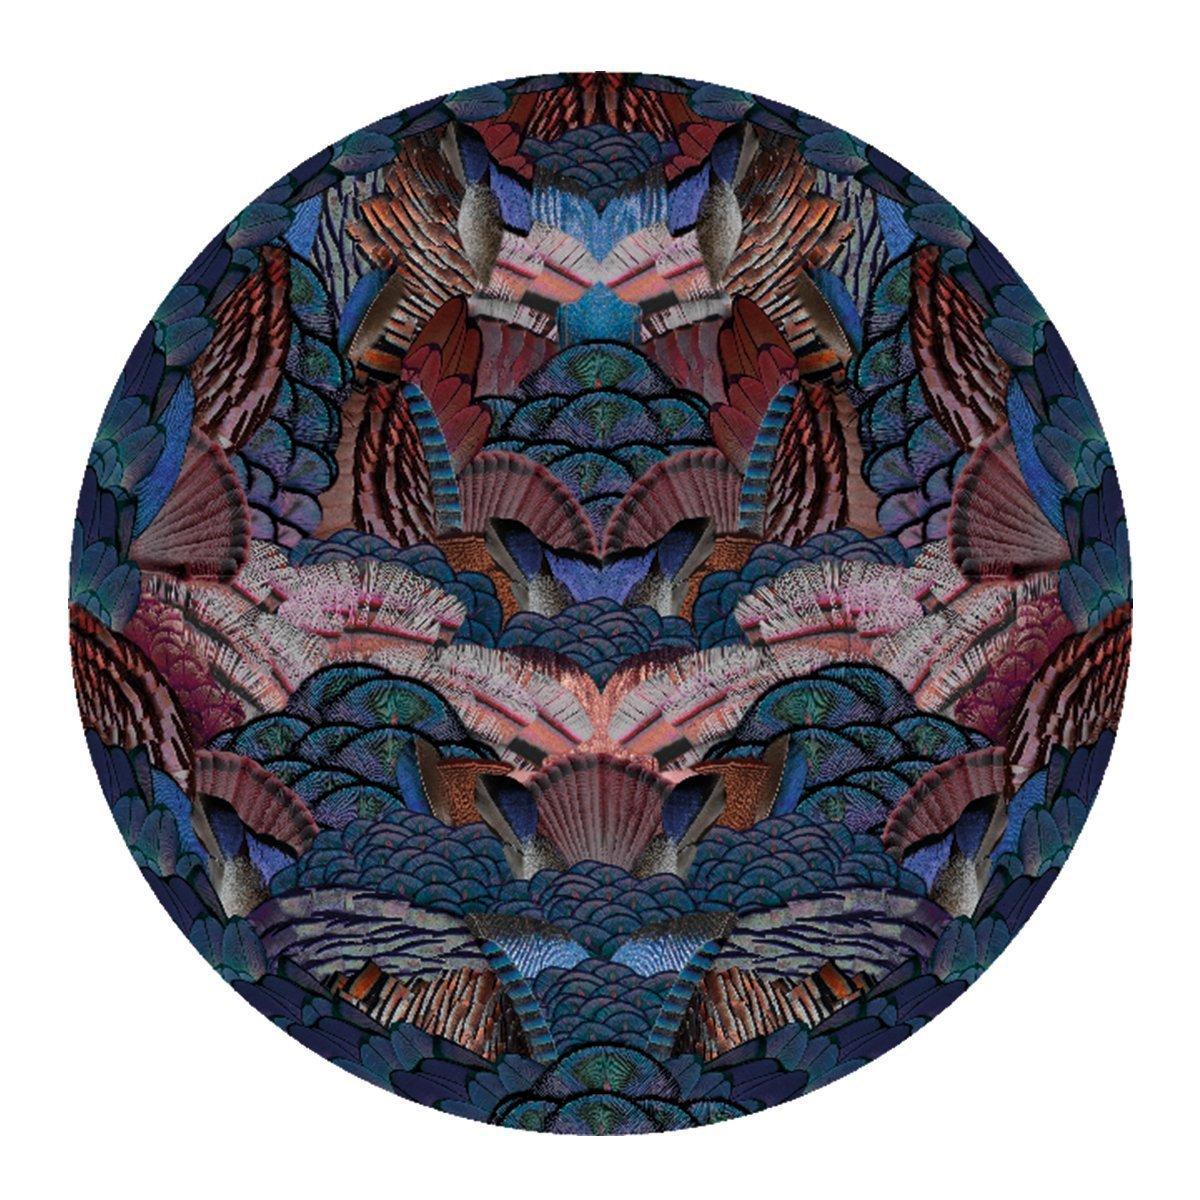 Moooi Carpets - Calligraphy Bird Vloerkleed - �350 cm. - Low Pile